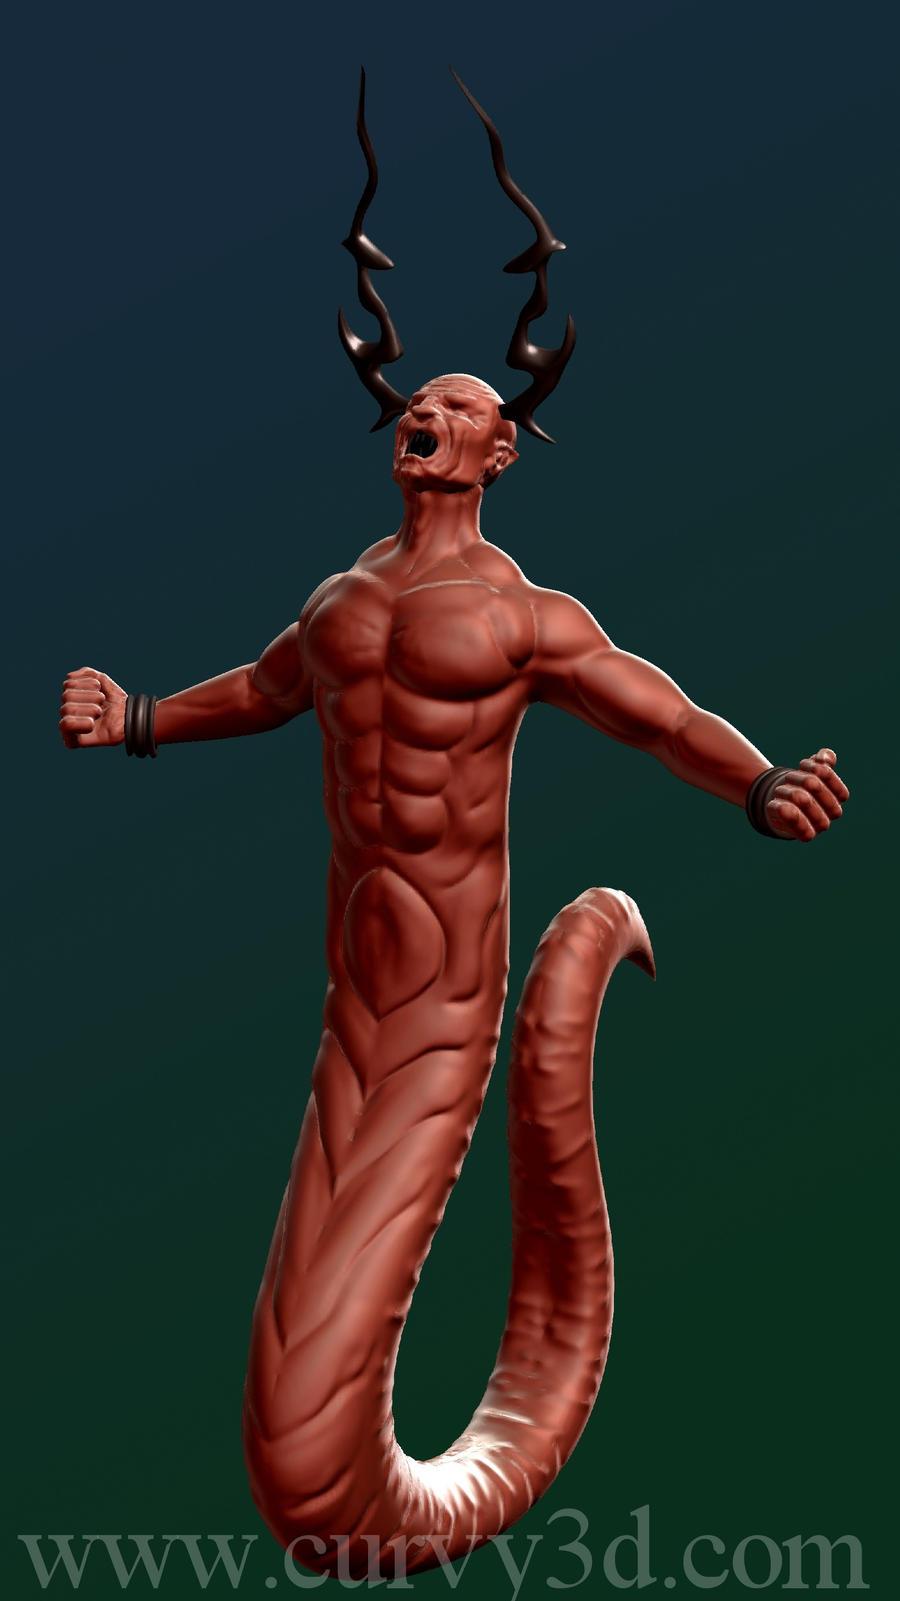 Snake Demon by Curvy3D